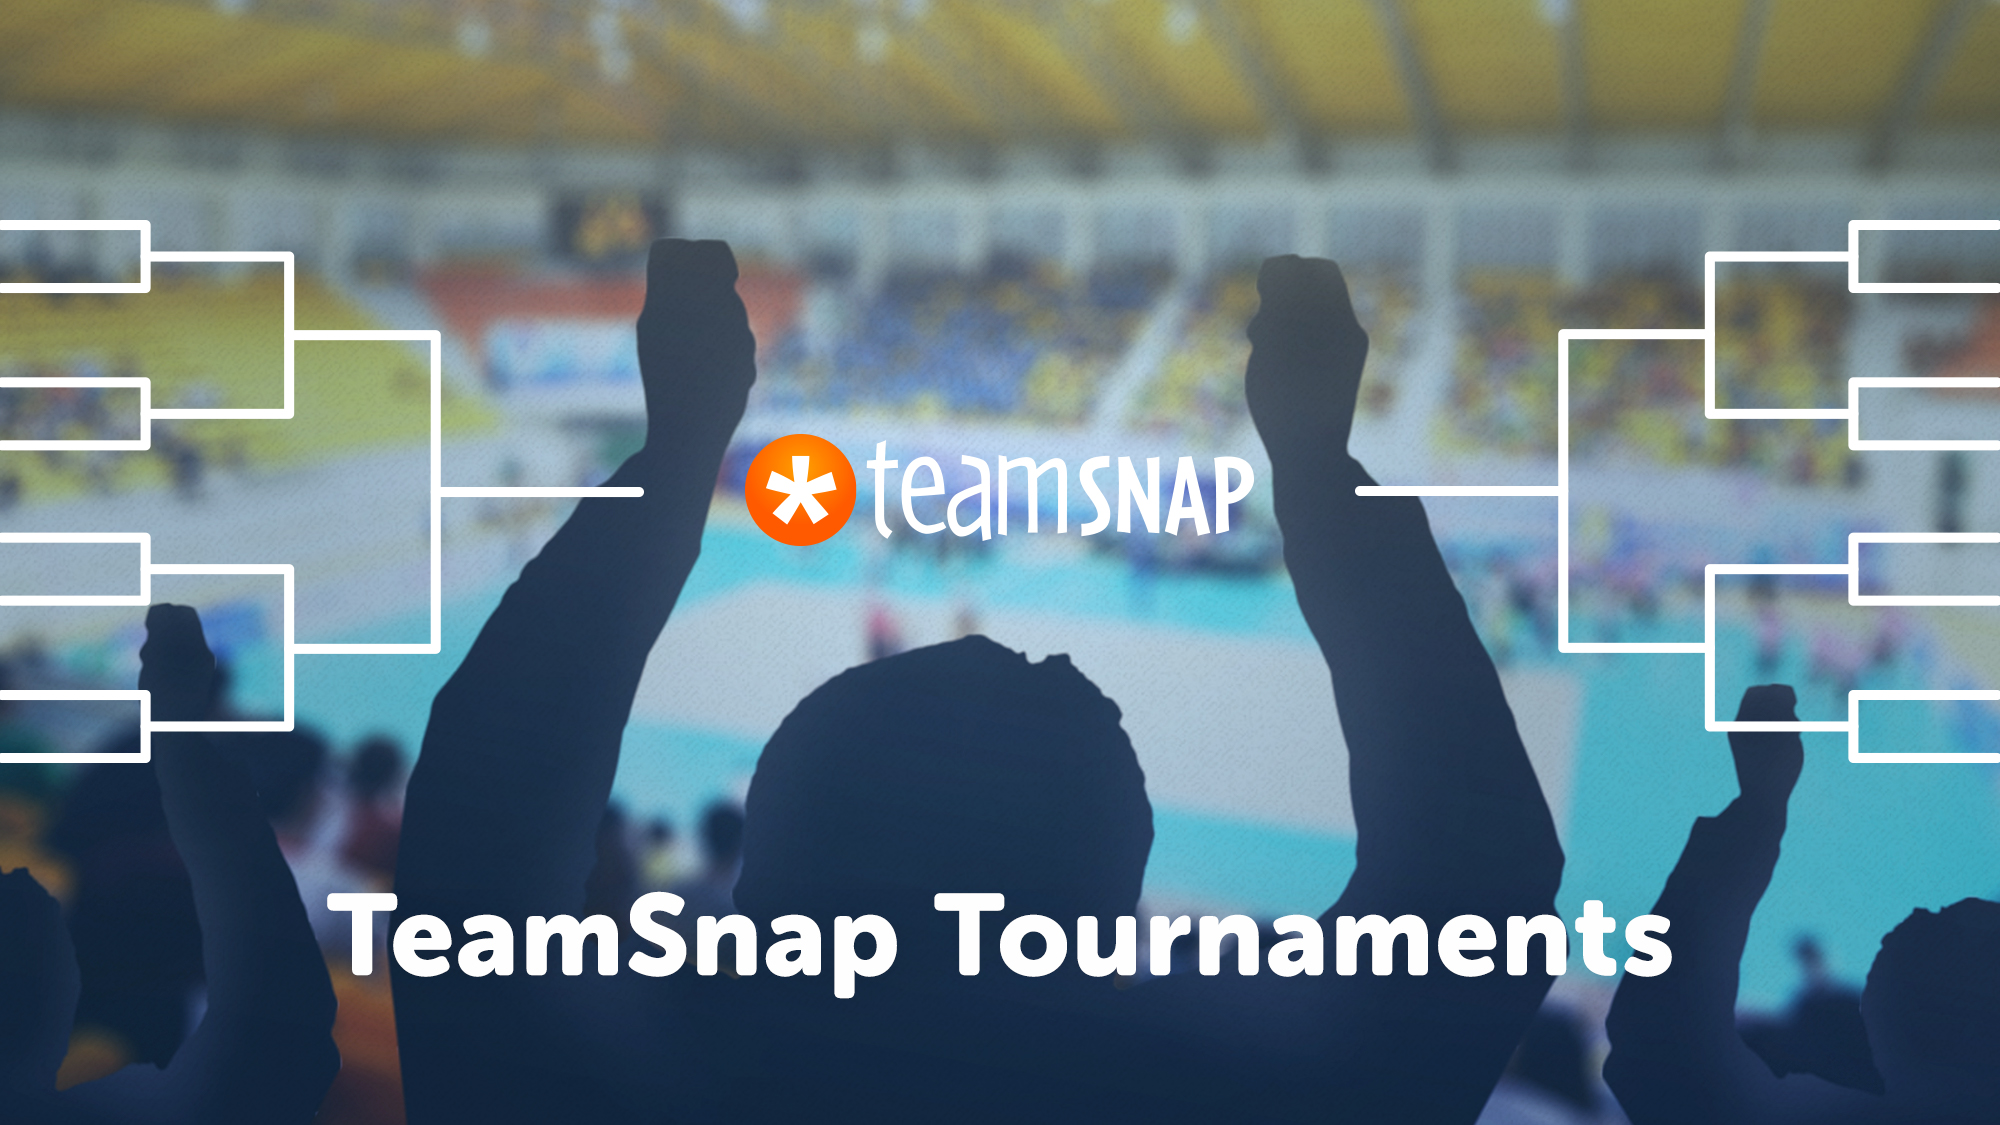 Introducing TeamSnap Tournaments